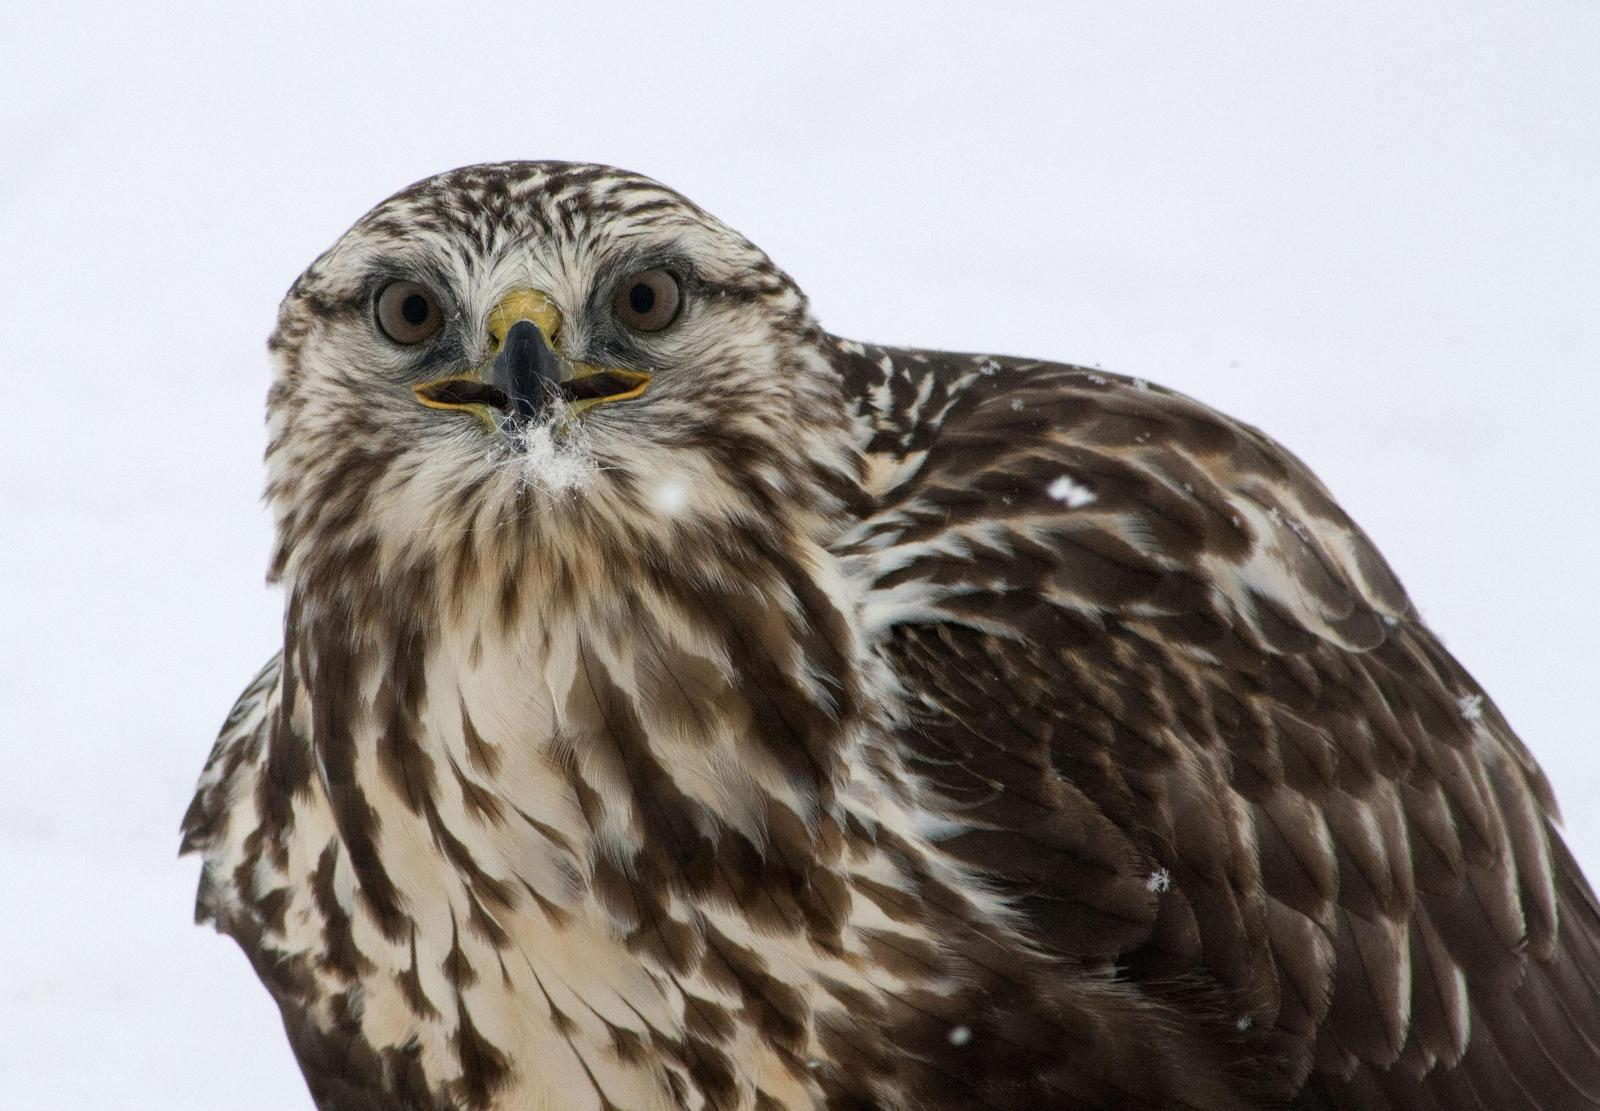 Rough-legged Hawk Photo by Melinda Quayle